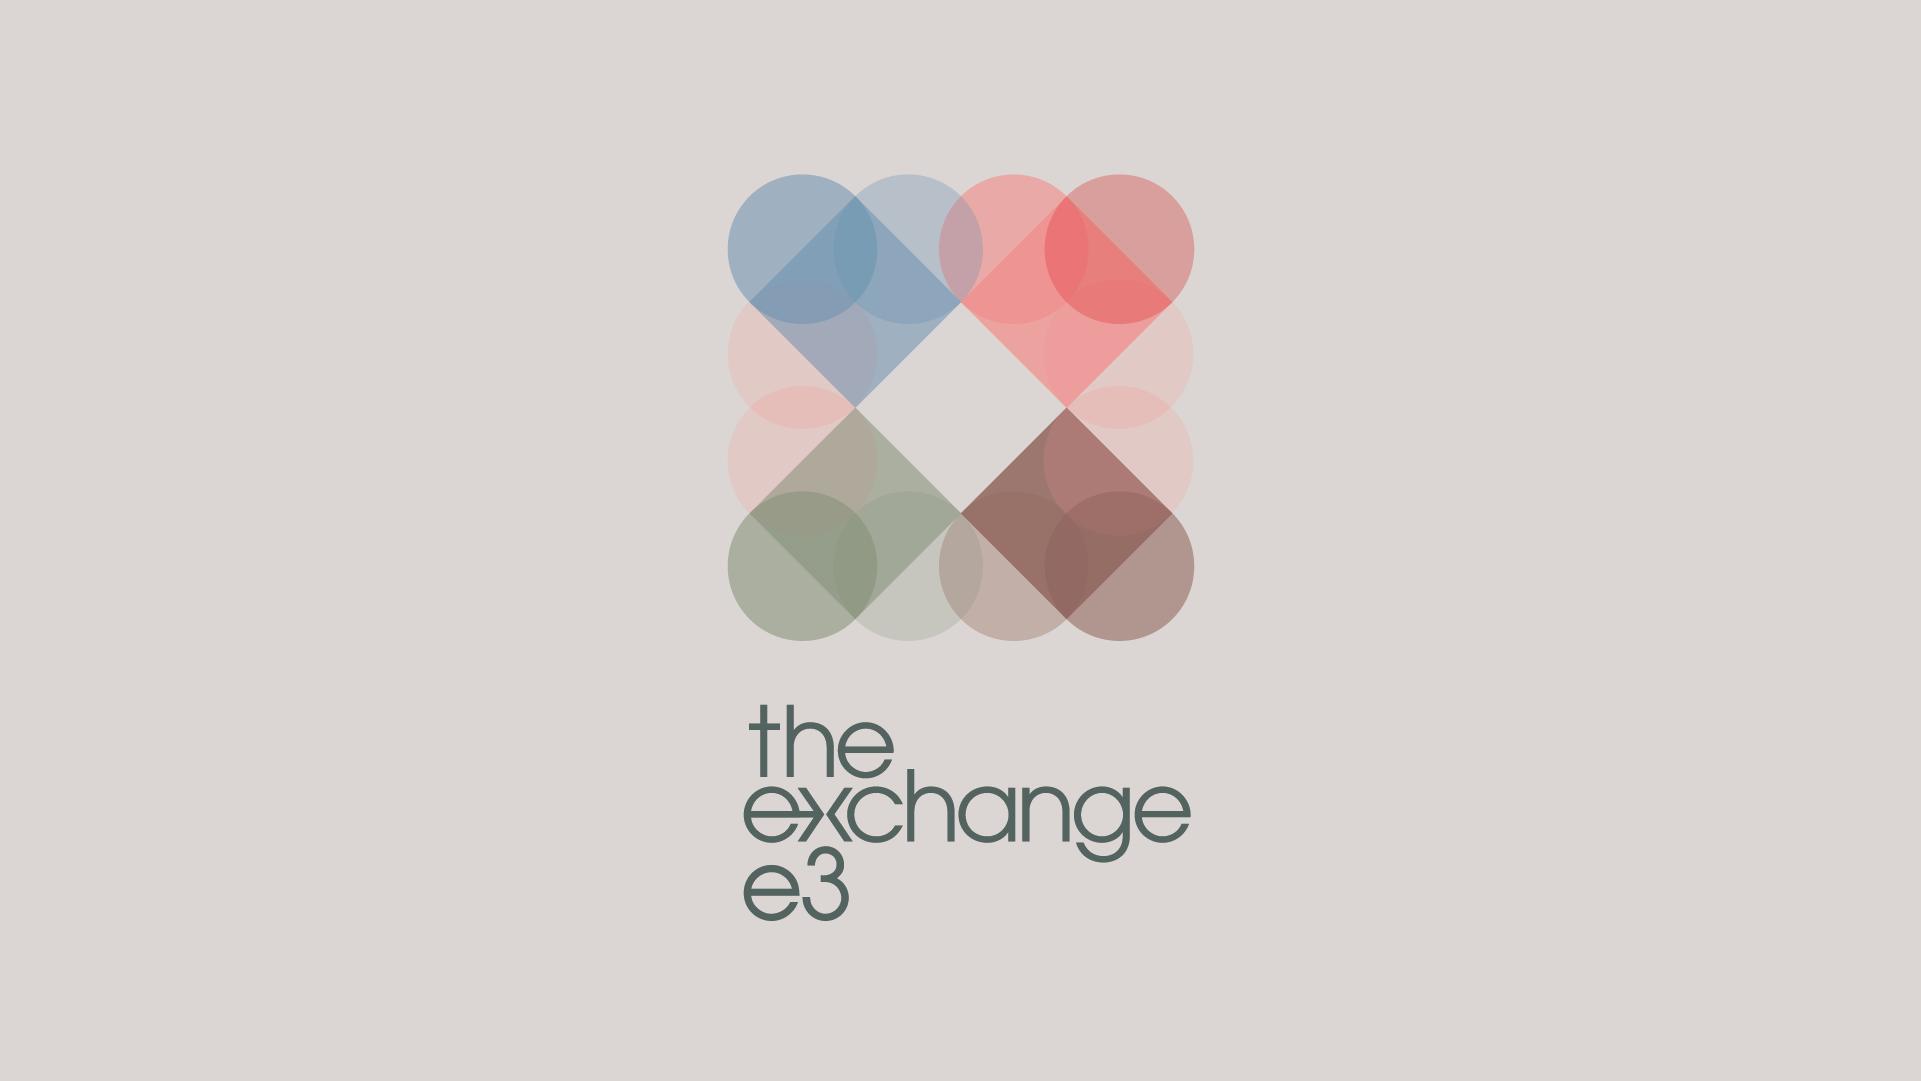 The Exchange E3